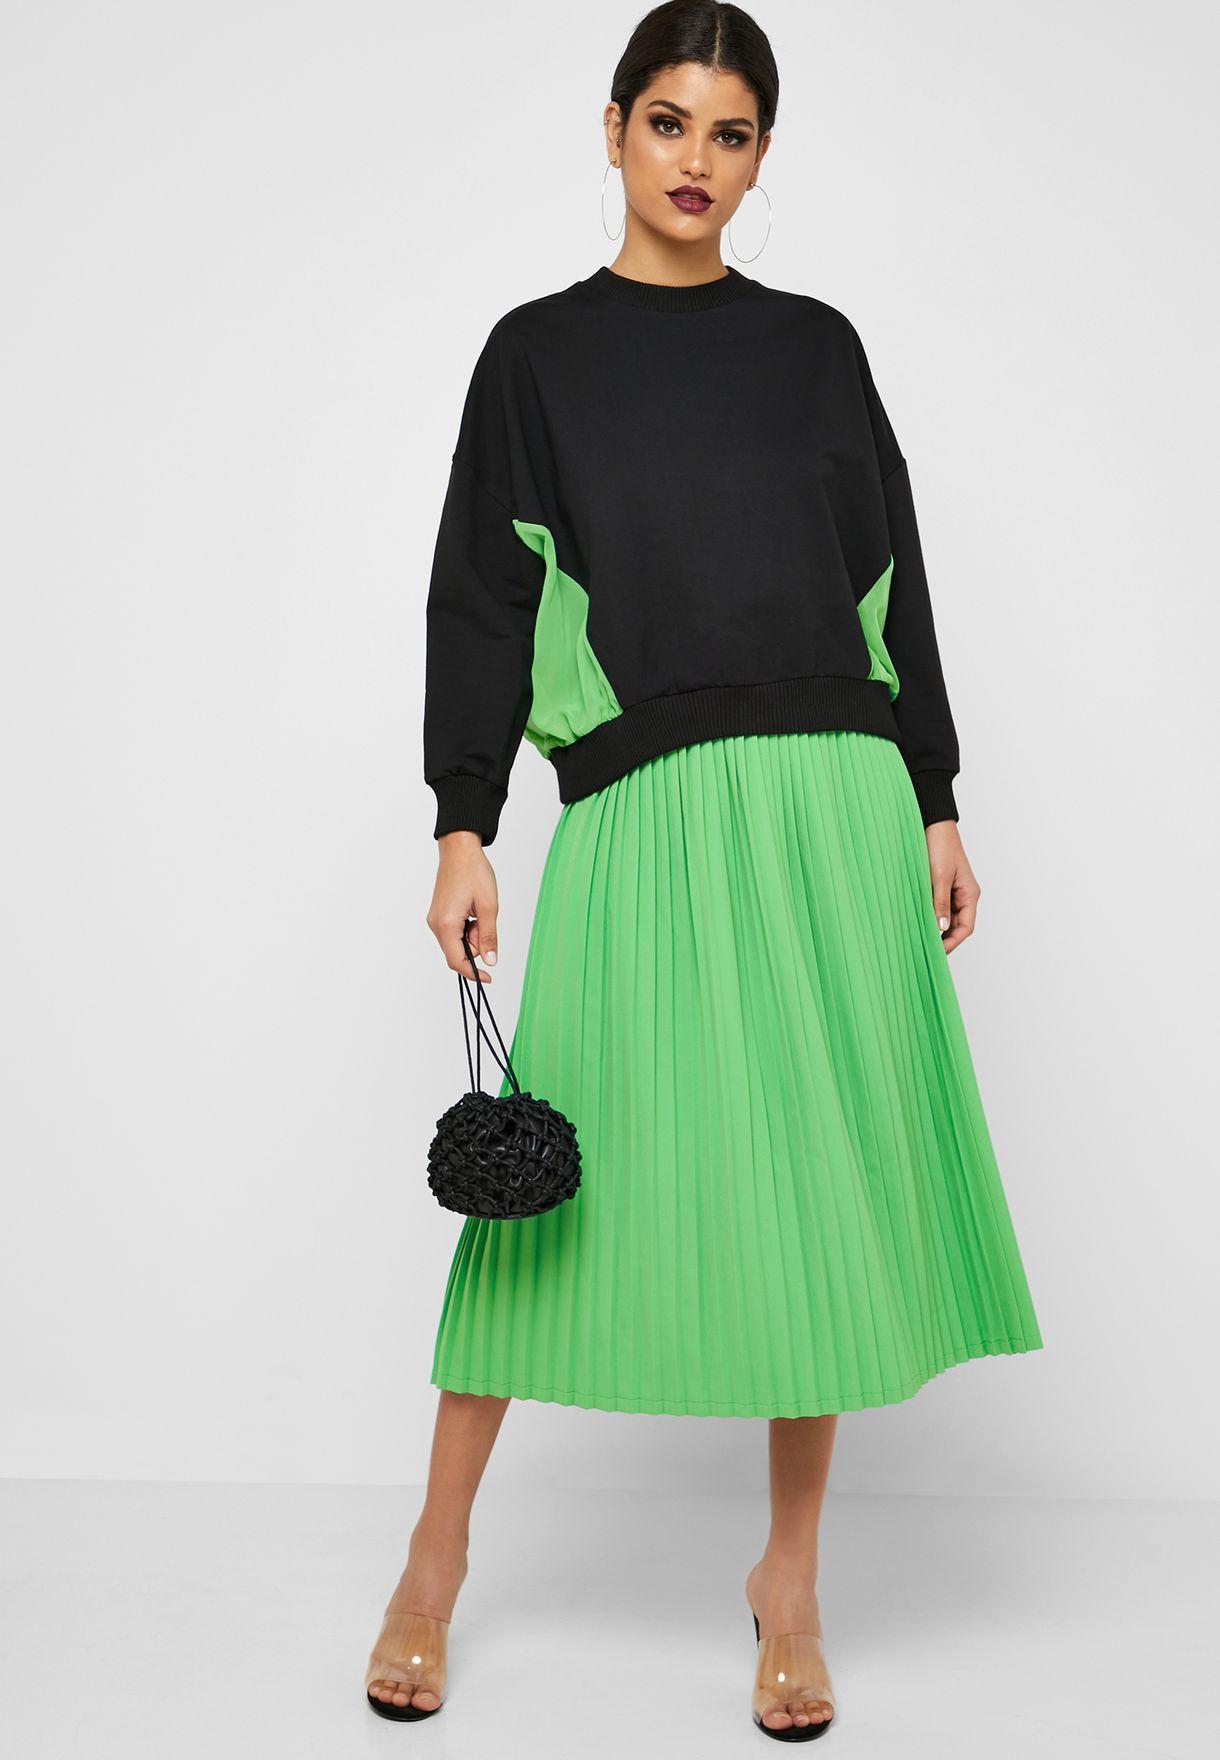 90b5728a40 Shop Anotah green Pleated Skirt 18AWSKI-E82183 for Women in UAE ...